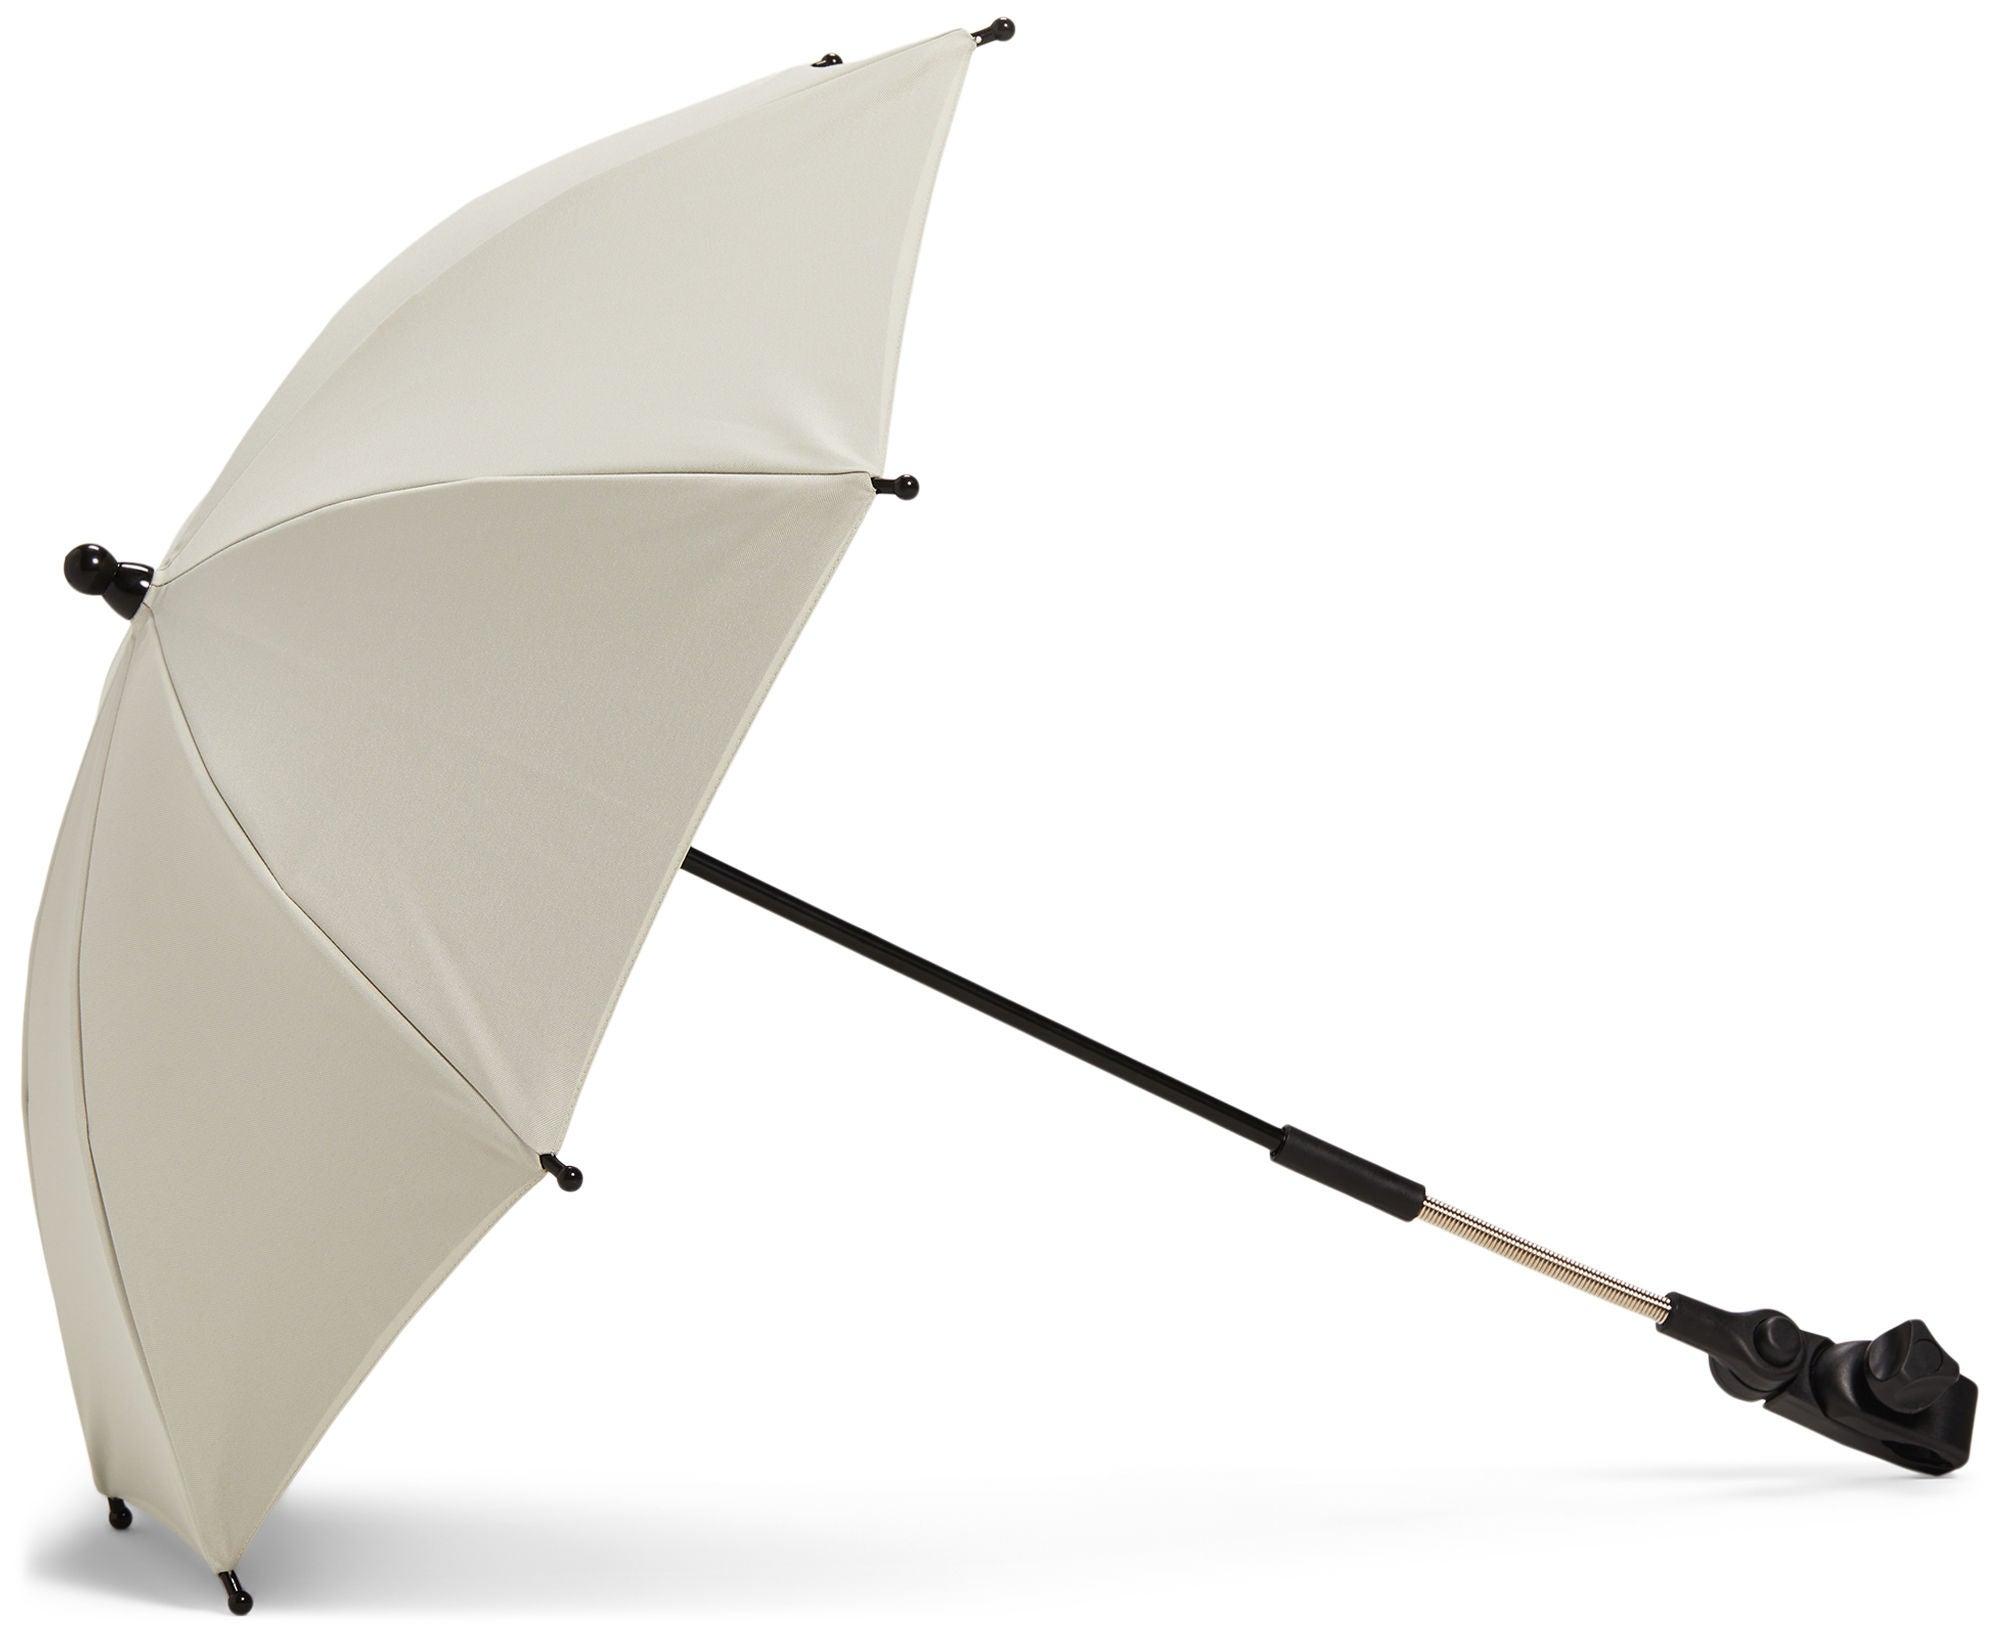 Beemoo Aurinkovarjo Lastenvaunuihin, Mineral Gray